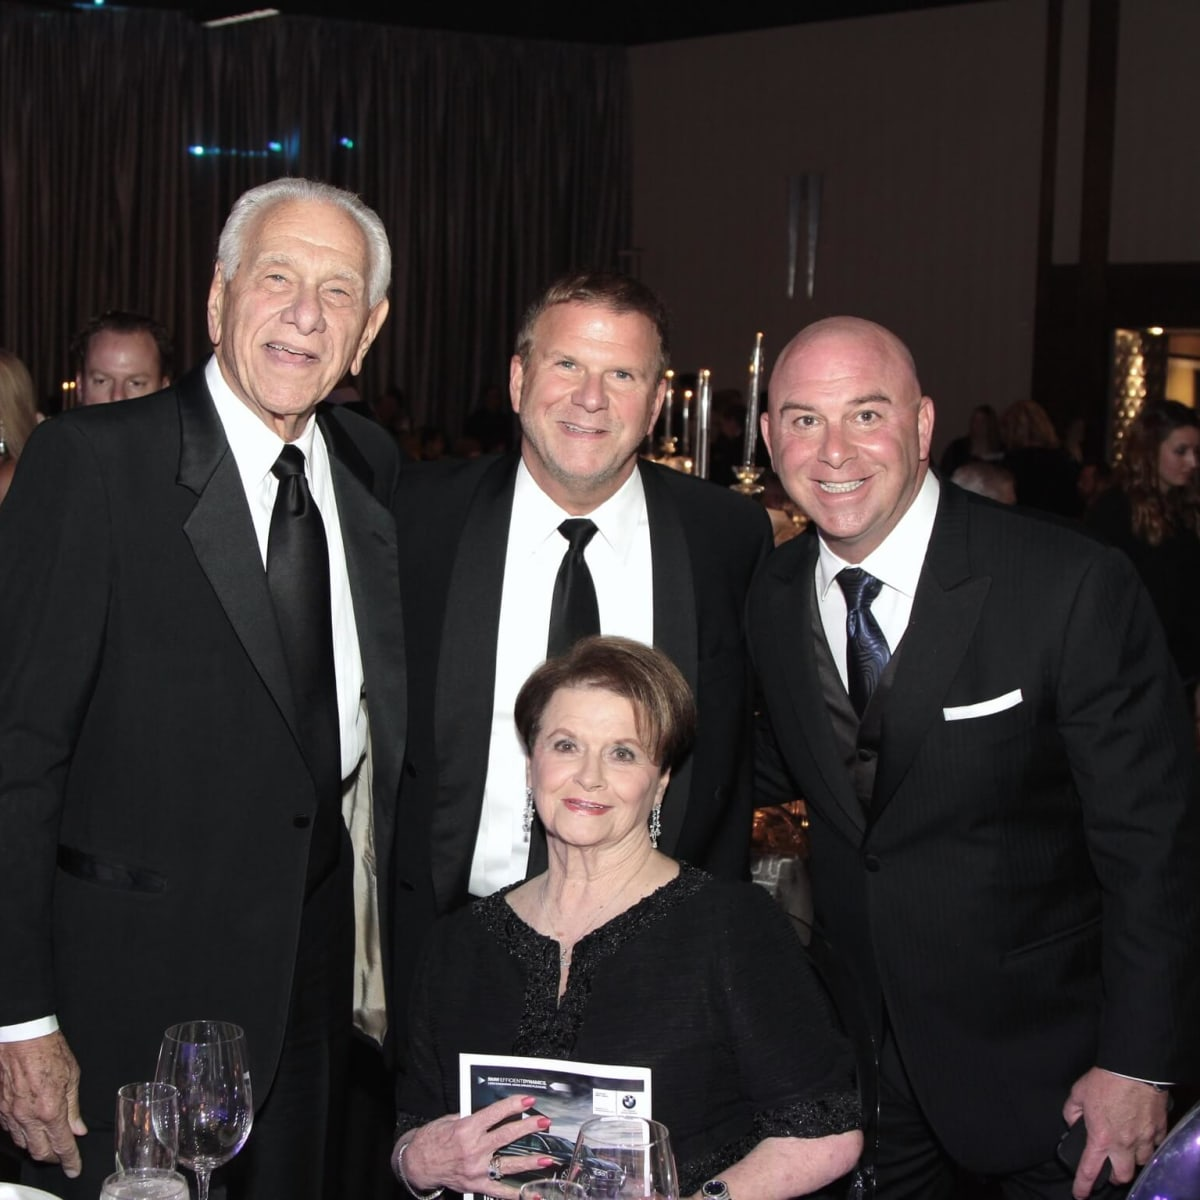 Houston Children's Charity 20th anniversary Vic Fertitta, Tilman Fertitta, Todd Fertitta, Joy Feritta